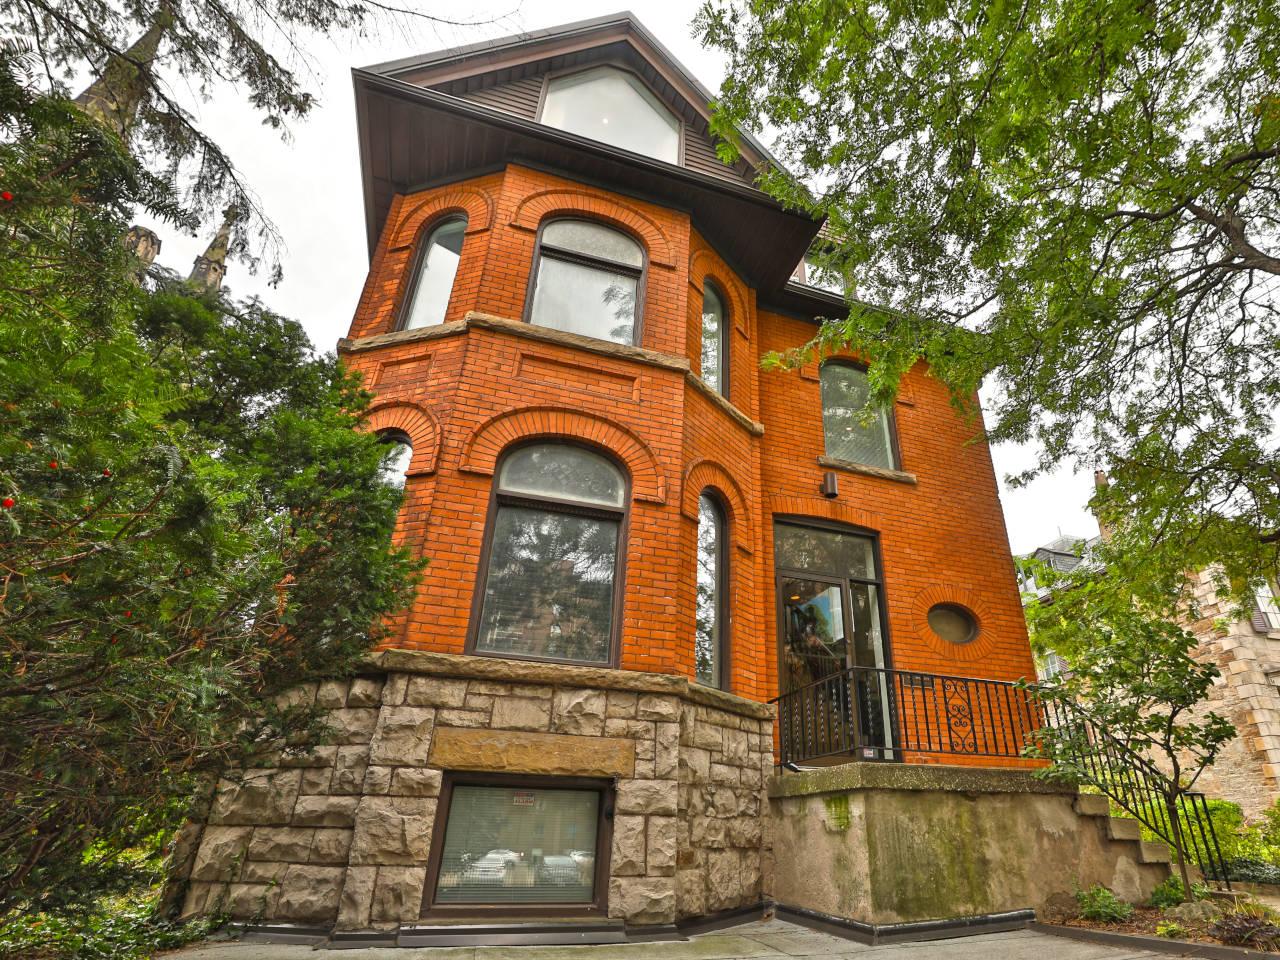 Commercial residential 1890s design circa